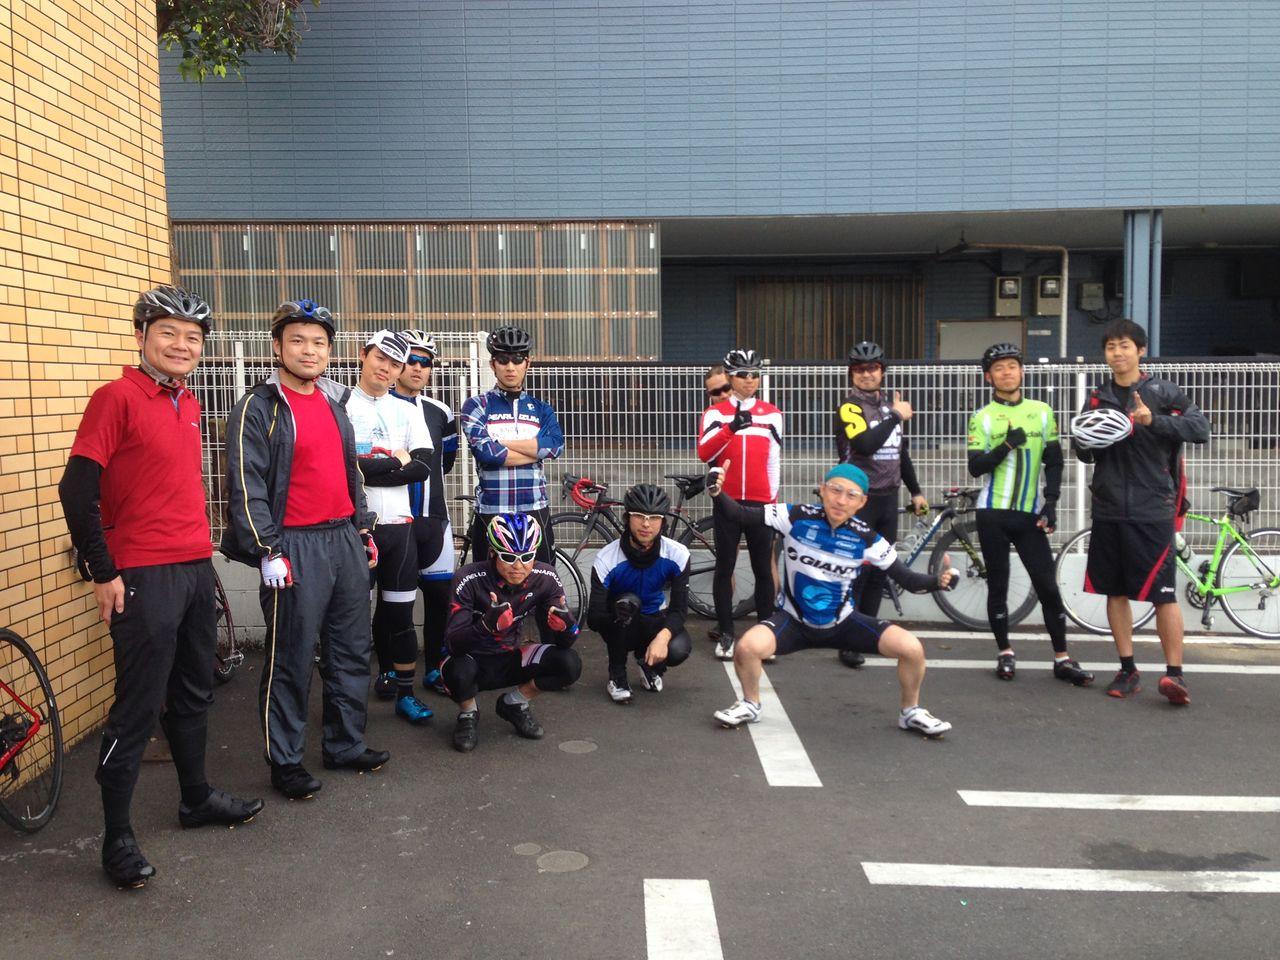 自転車店 平塚 自転車店 : SBC湘南藤沢店の FACEBOOK ページ ...